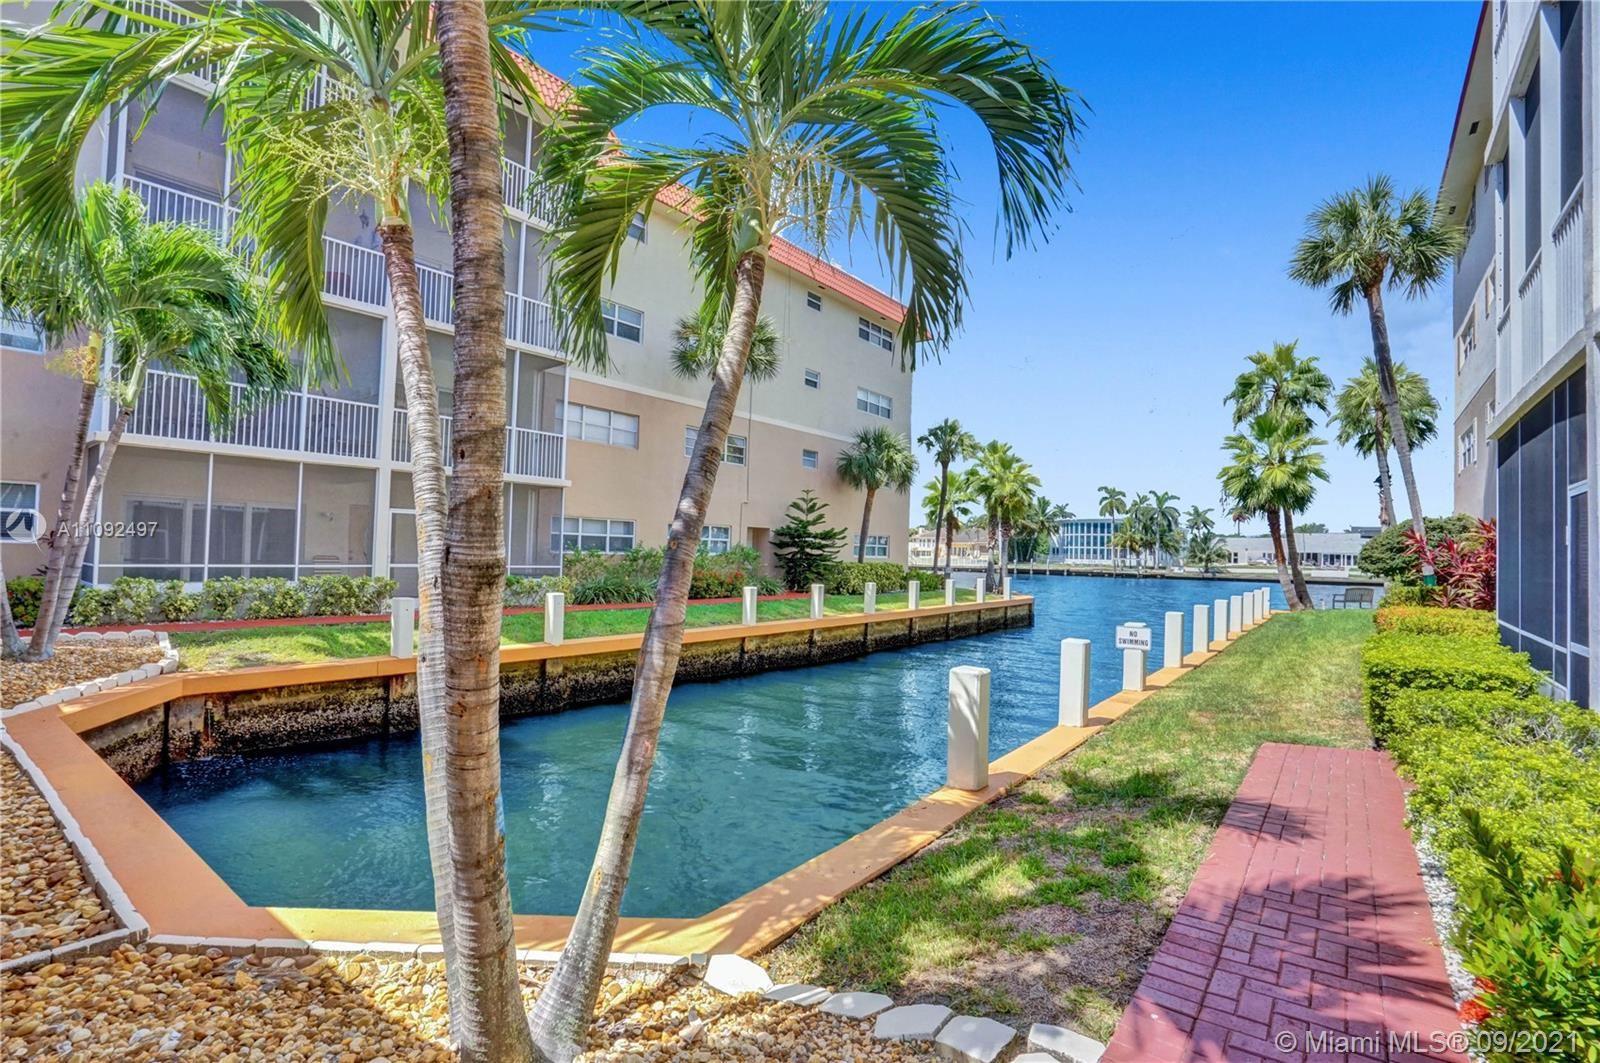 Photo of 2097 S Ocean Dr #406, Hallandale Beach, FL 33009 (MLS # A11092497)